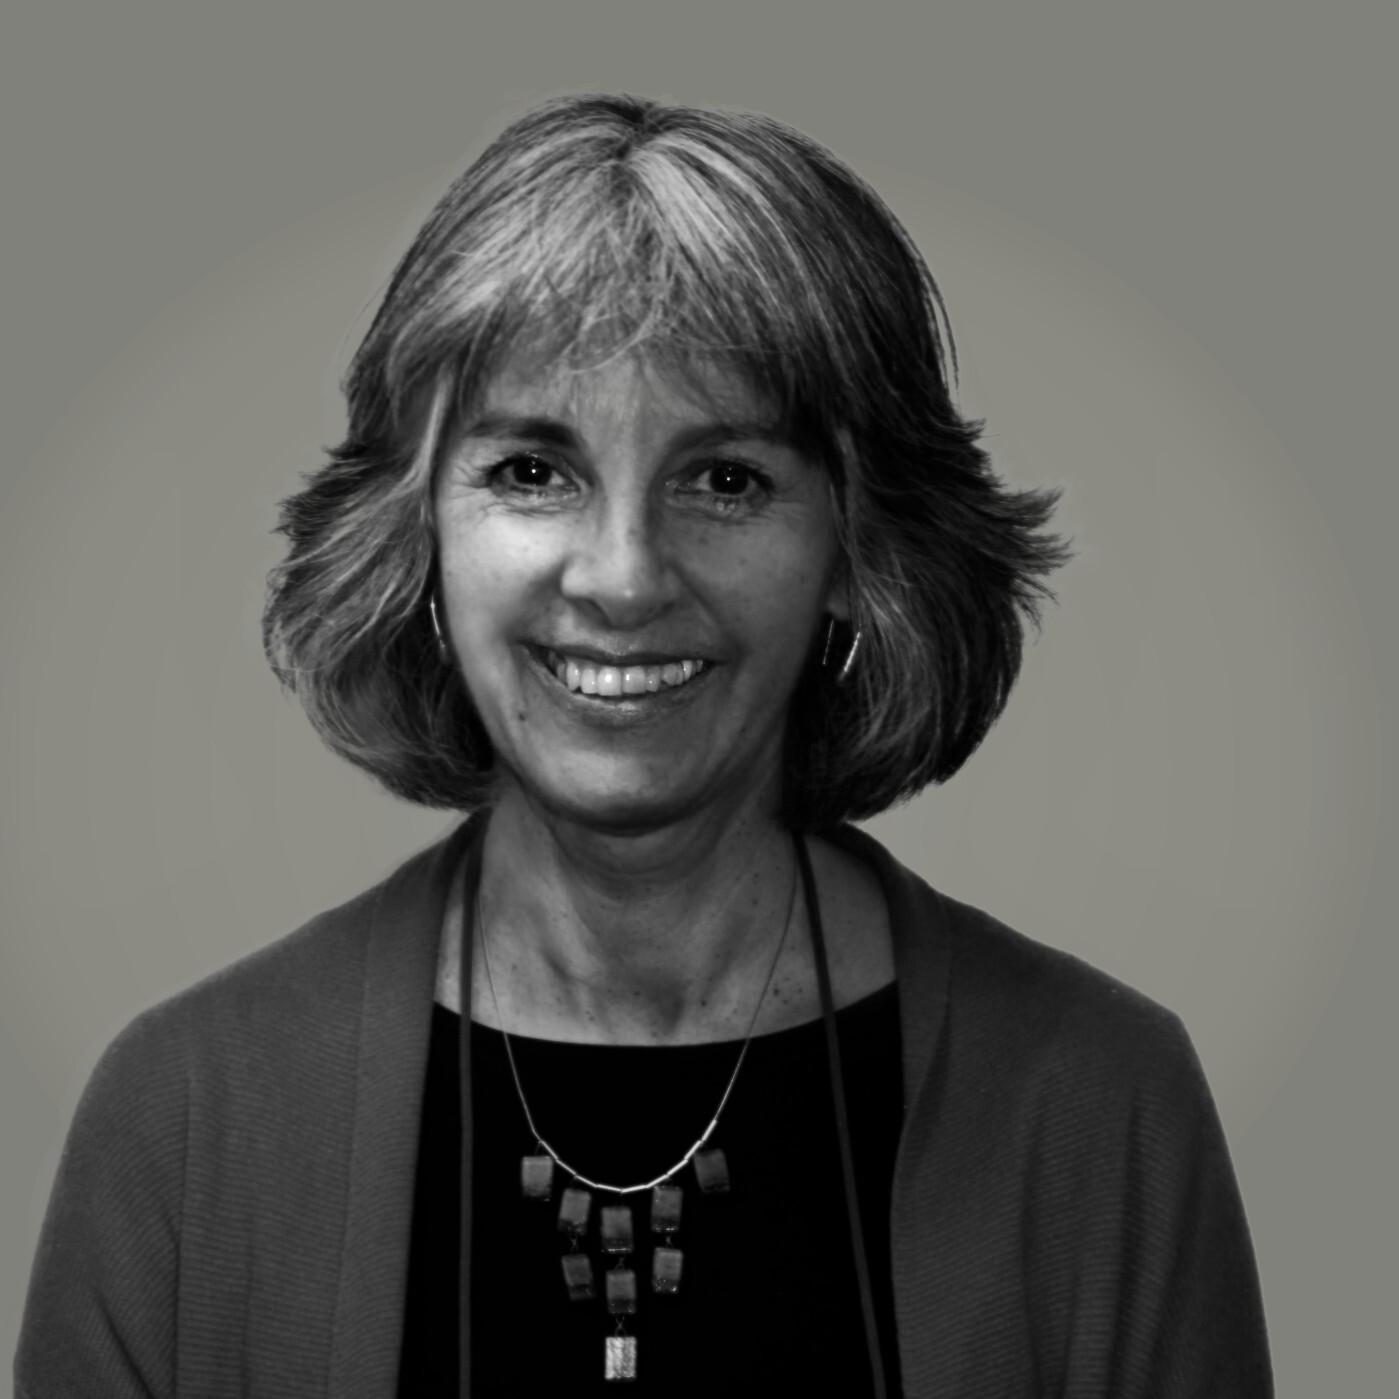 Muriel Watt